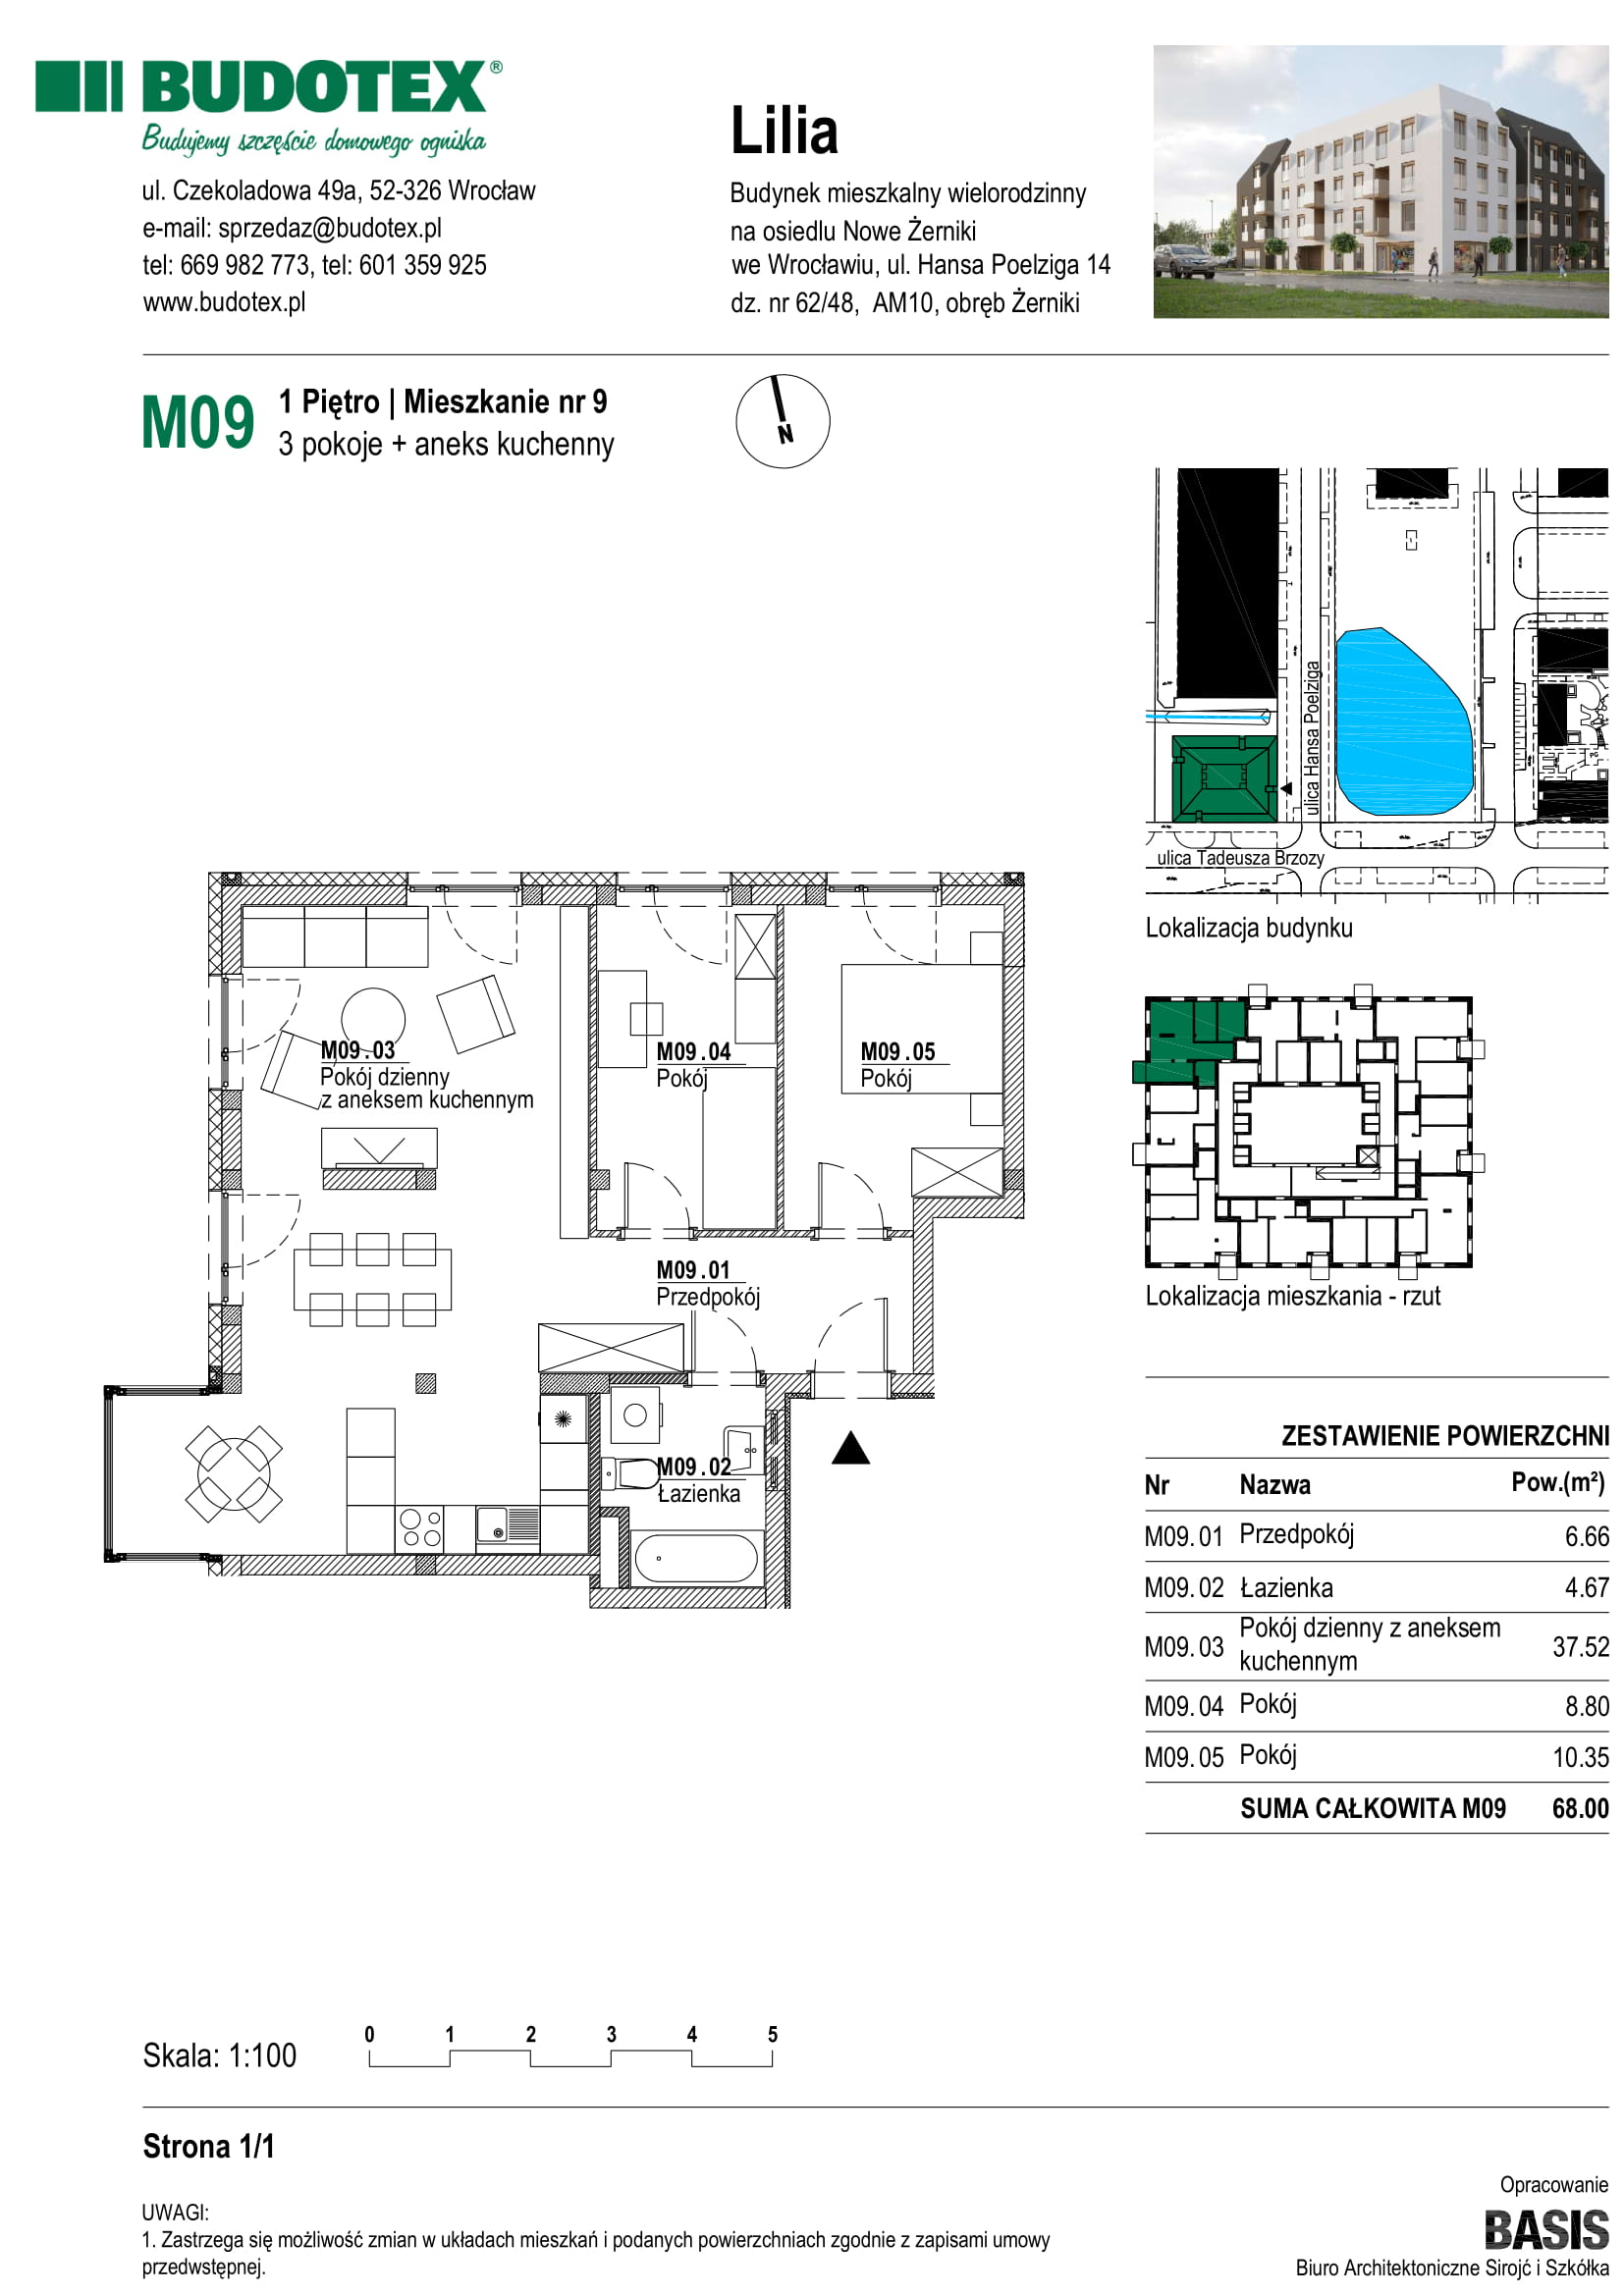 Mieszkanie nr M09